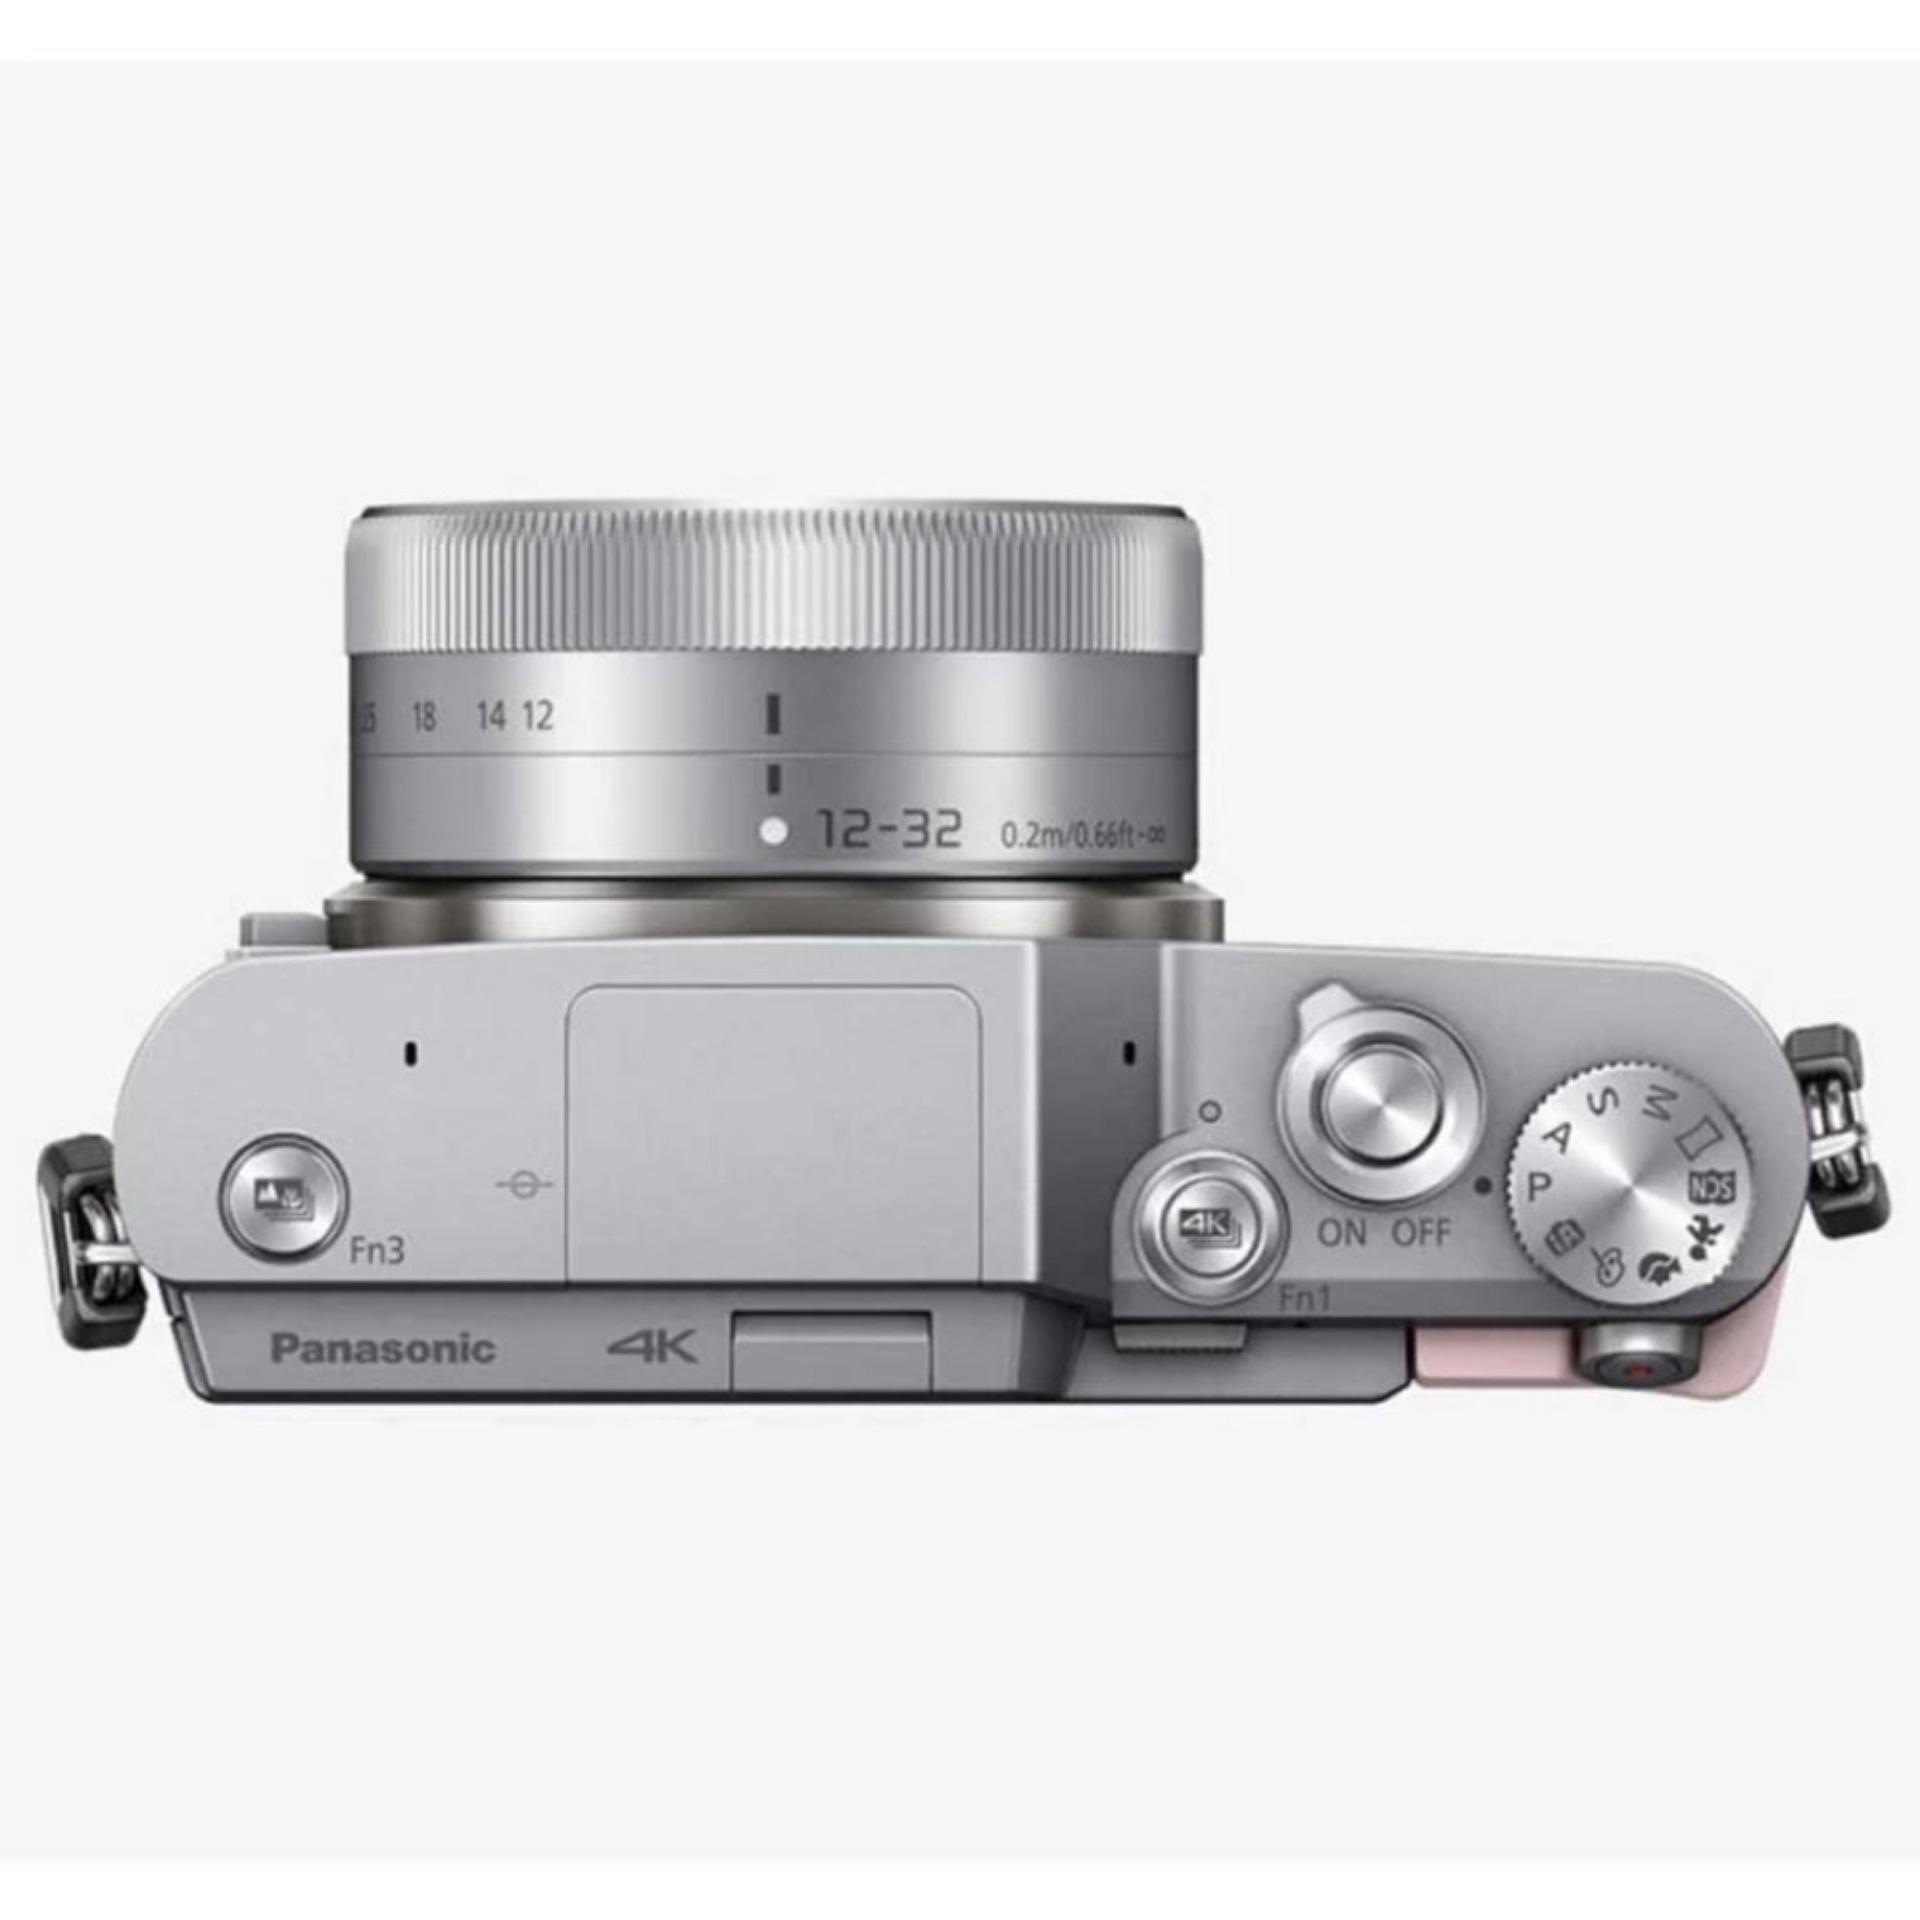 Harga Dan Spek Panasonic Lumix Dmc Gx85 Kit 12 32mm Silver Black Hitam Perbandingan Gf9 Gratis Brown Free 32gb